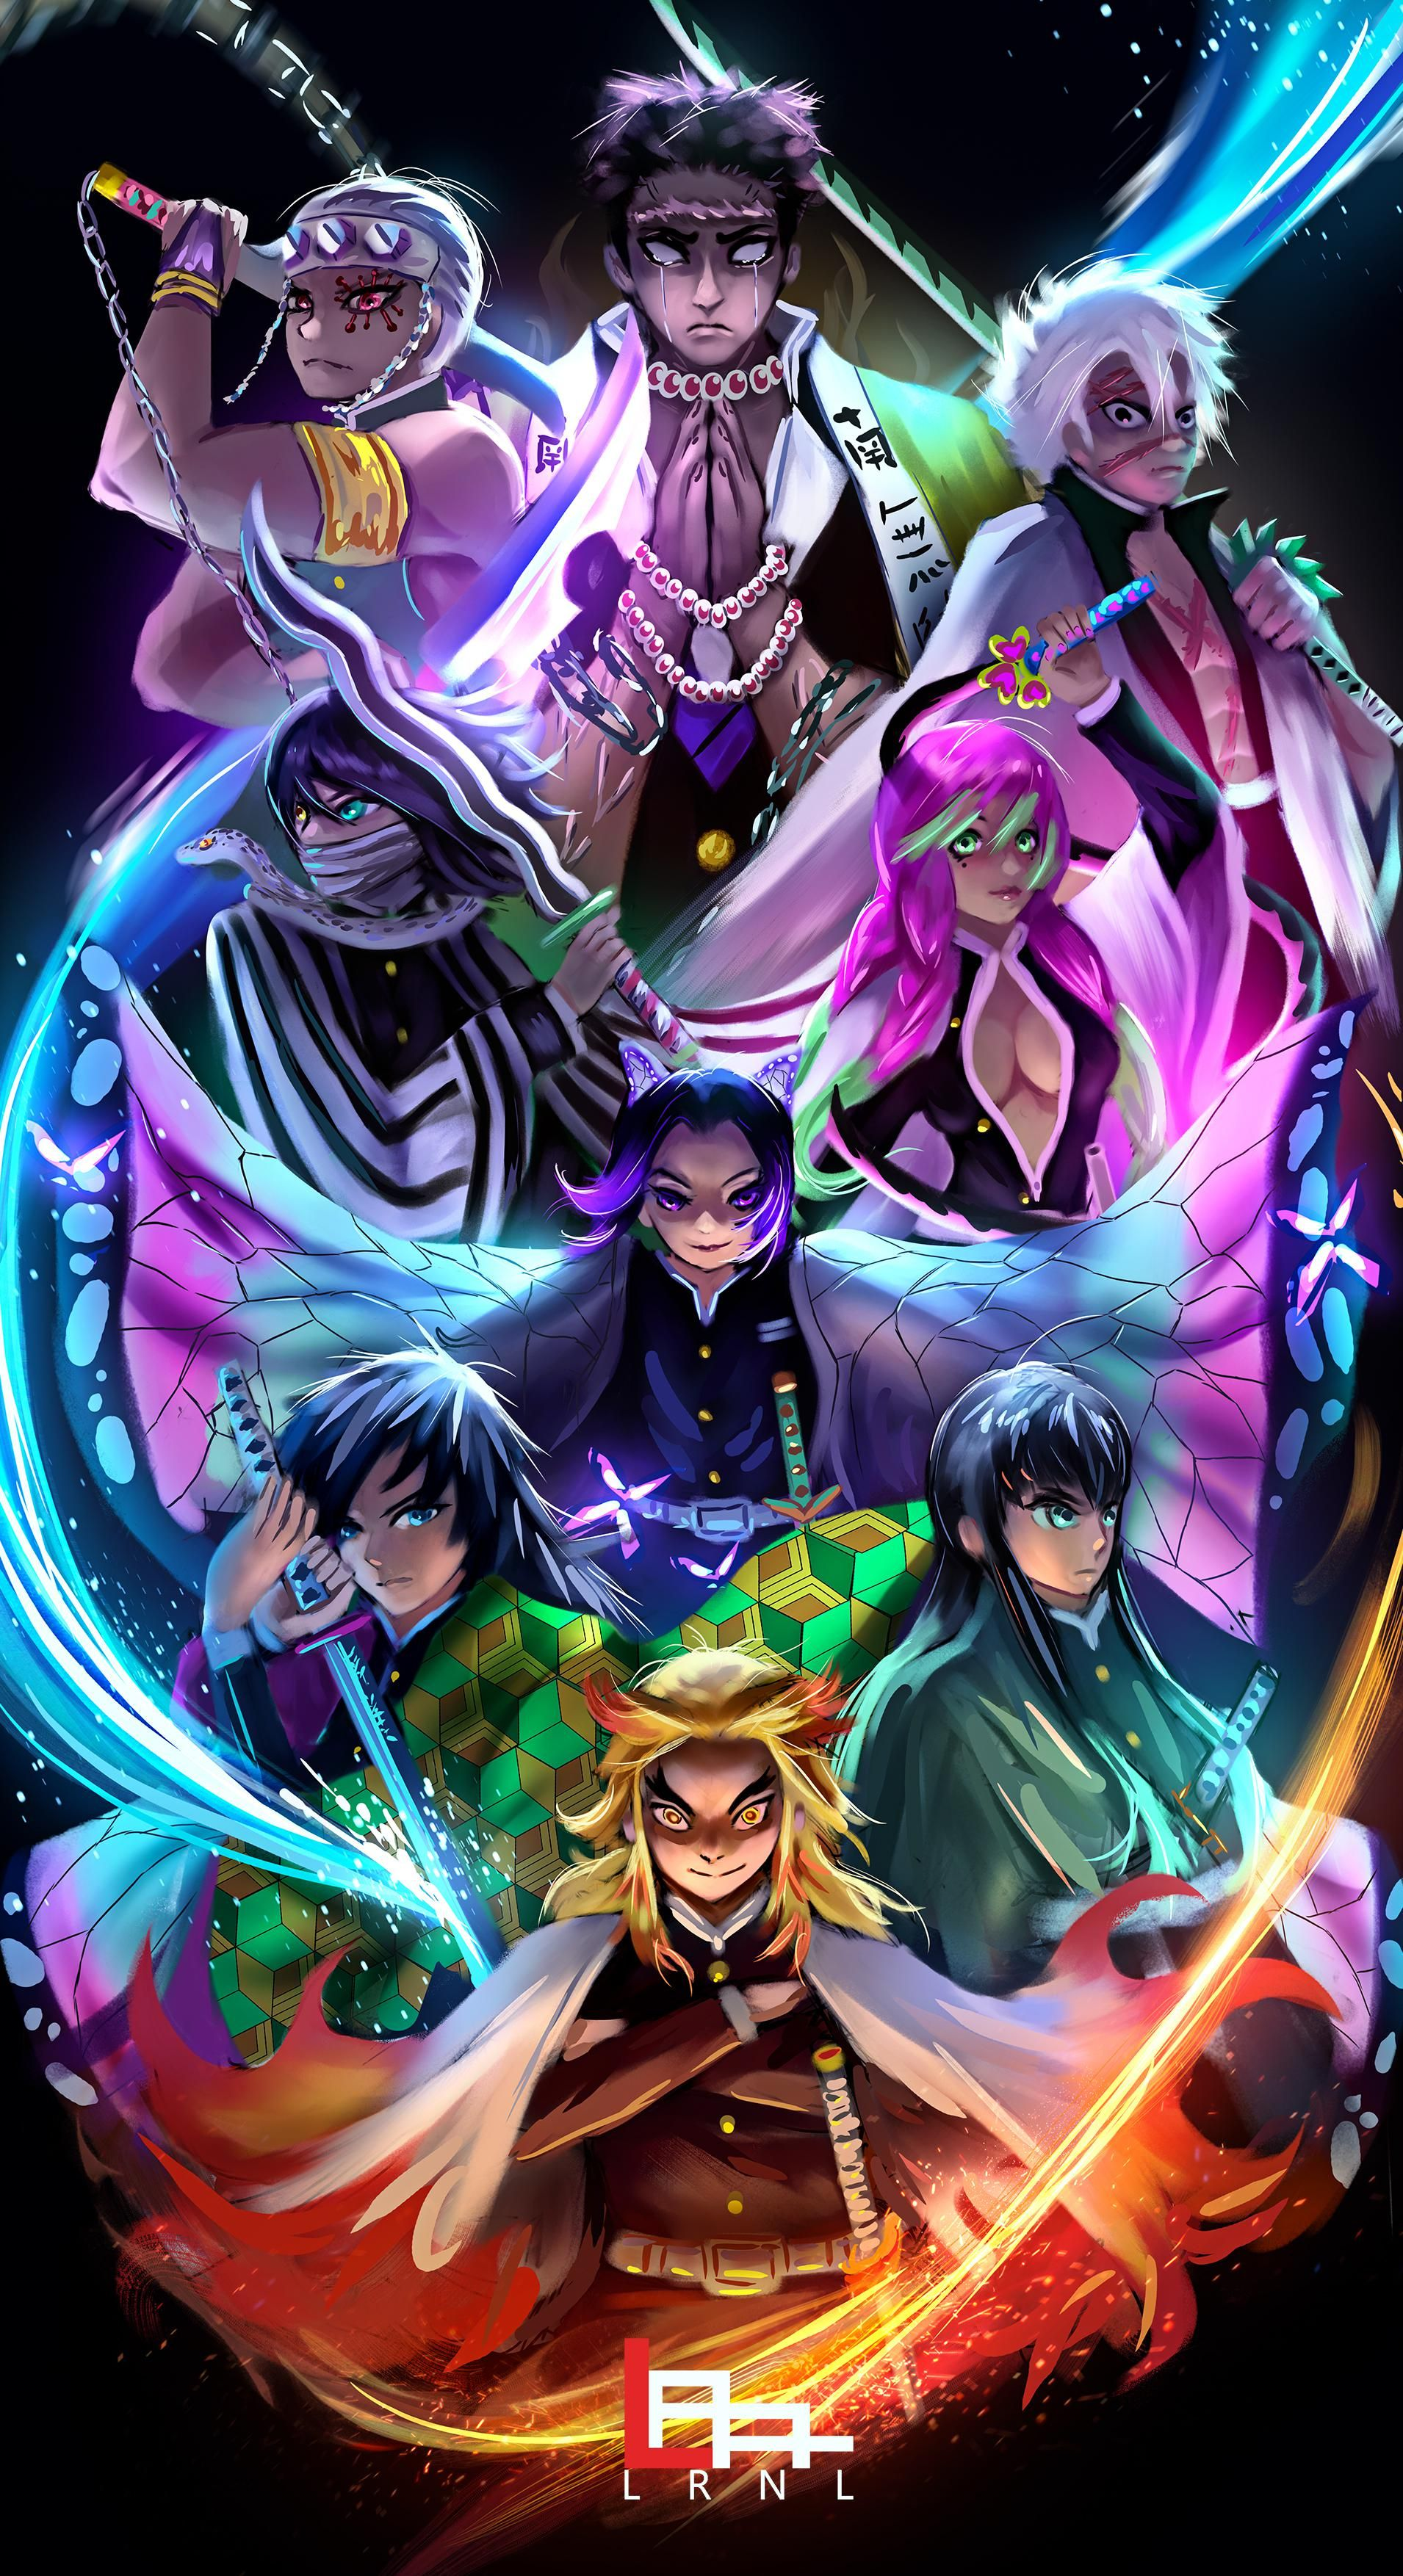 All Hashiras Lrnl Me Digital 2019 Art In 2020 Anime Demon Cool Anime Wallpapers Anime